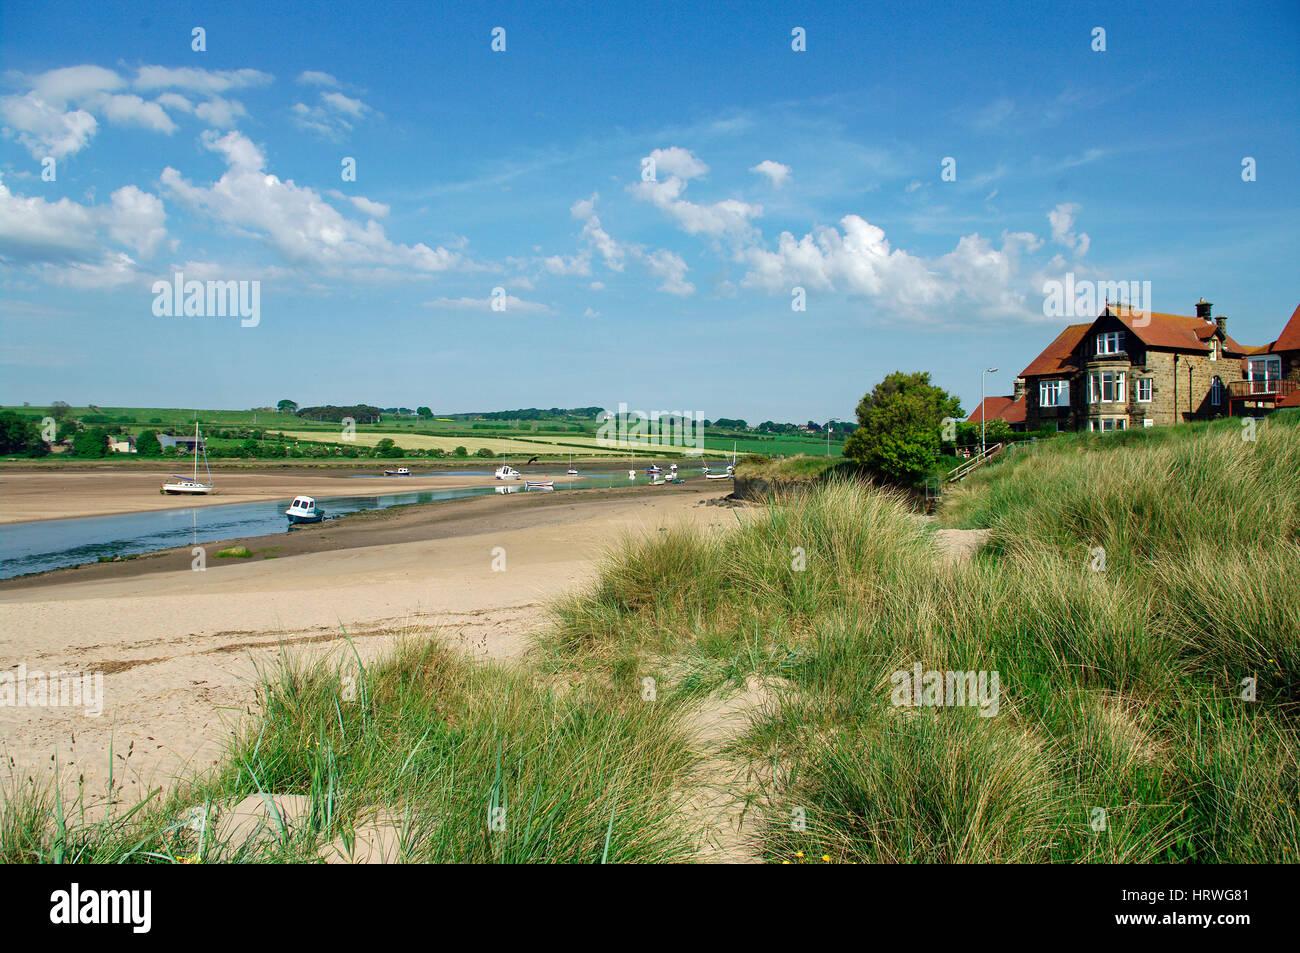 Alnmouth,Northumberland - Stock Image